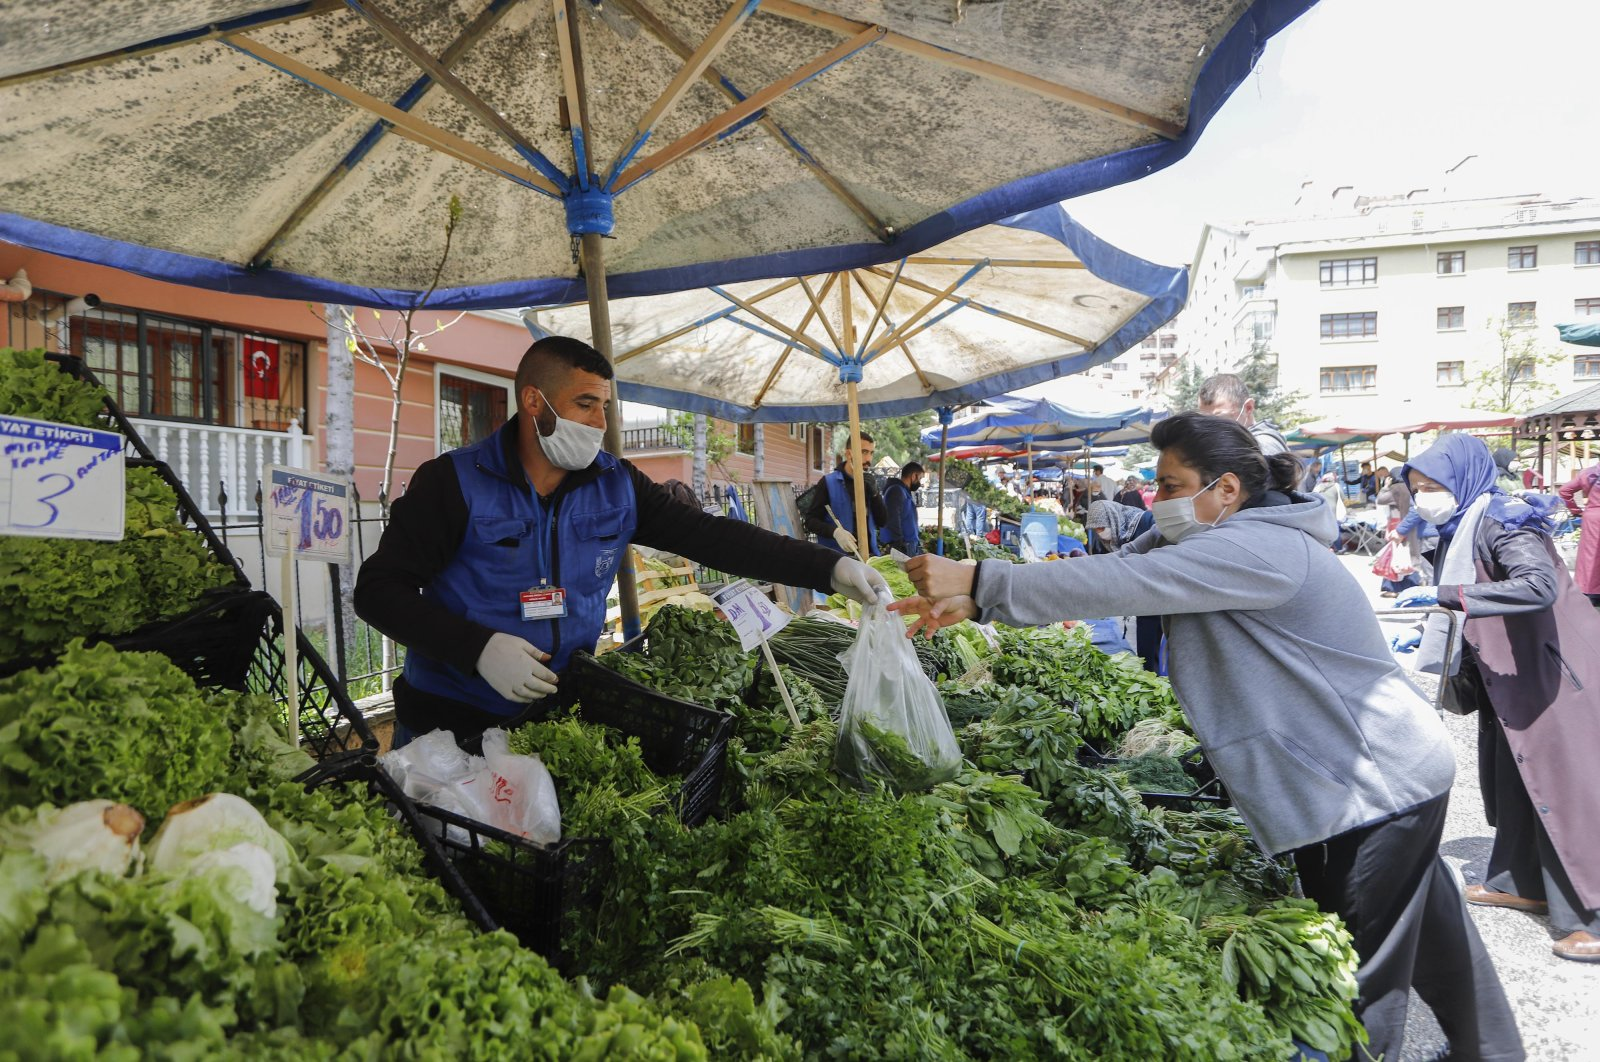 İmdat Kibar, a recovered coronavirus patient, works behind his stall at a marketplace, in Ankara, Turkey, Tuesday, May 5, 2020. (DHA Photo)